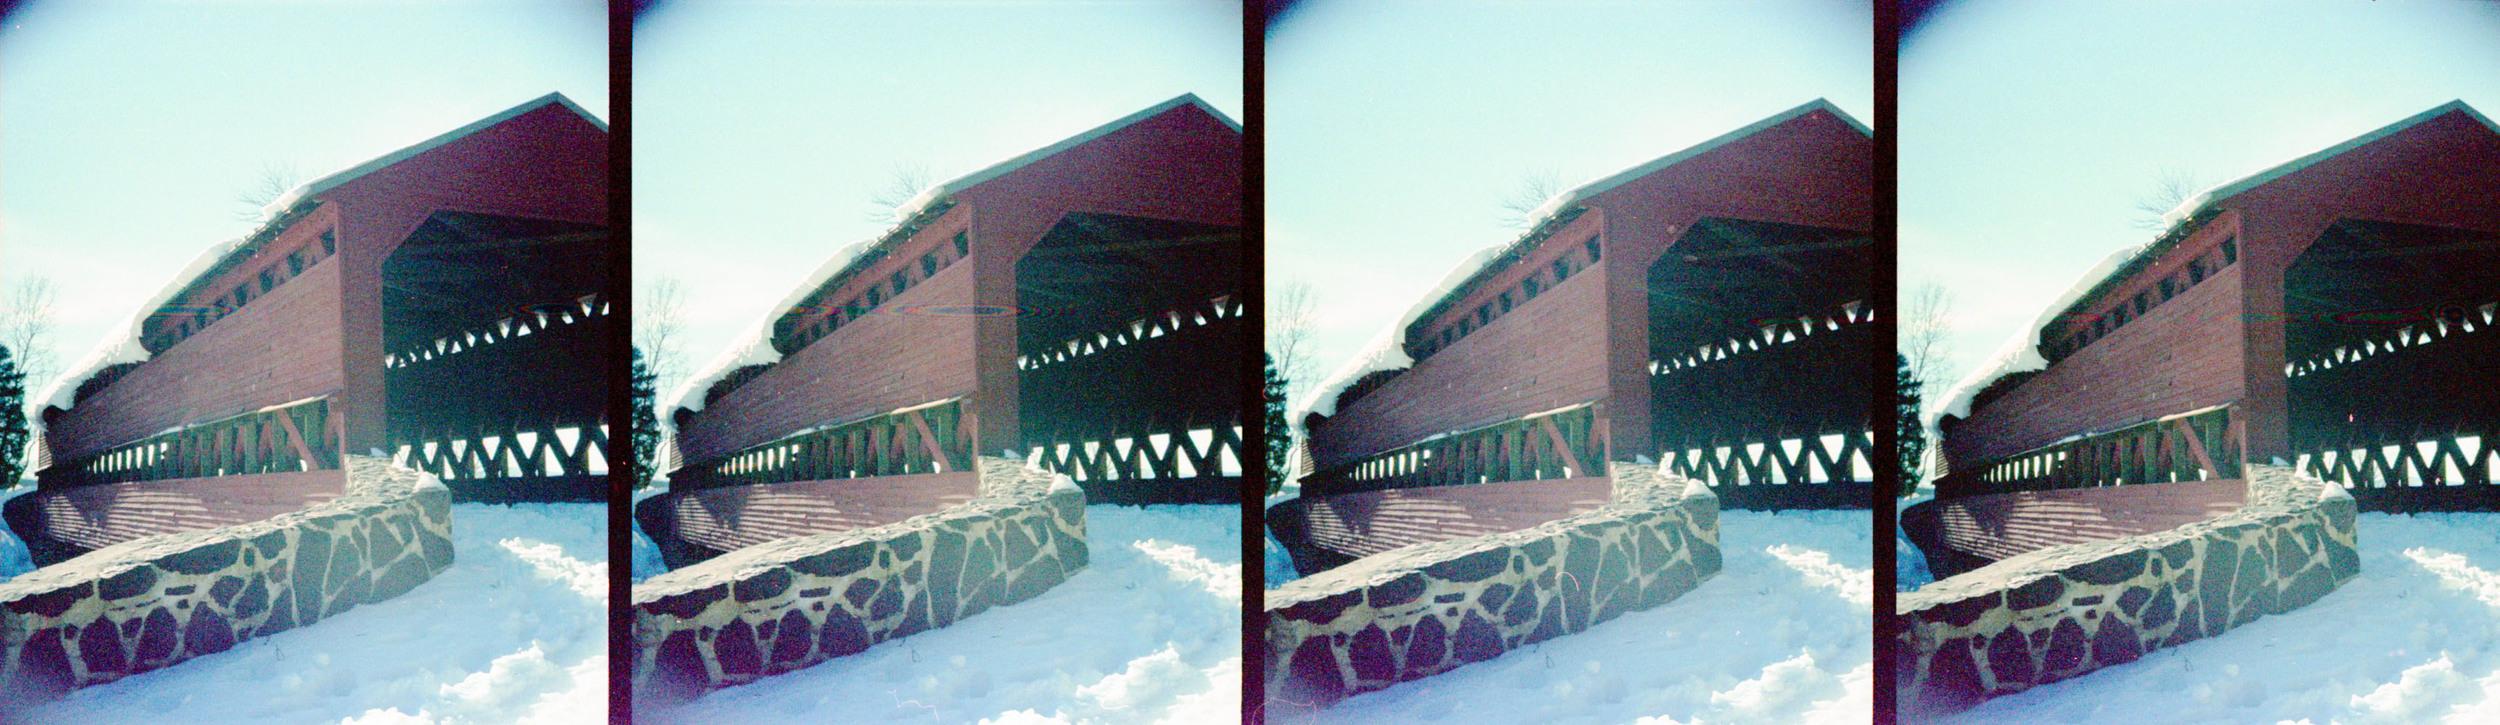 sachs_bridge.jpg